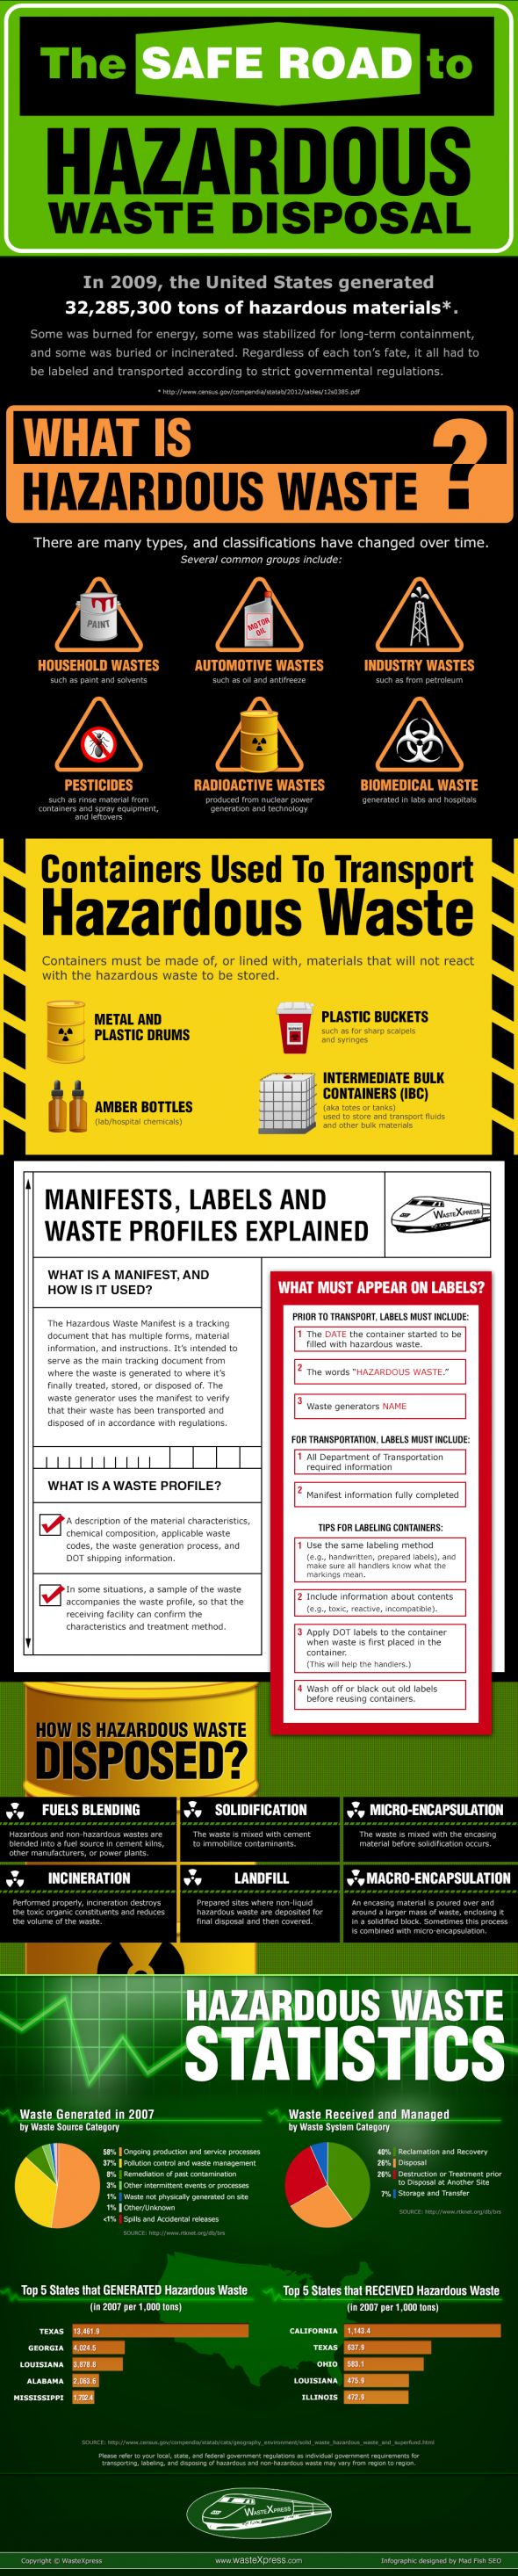 Infographic: The Safe Road to Hazardous Waste Disposal